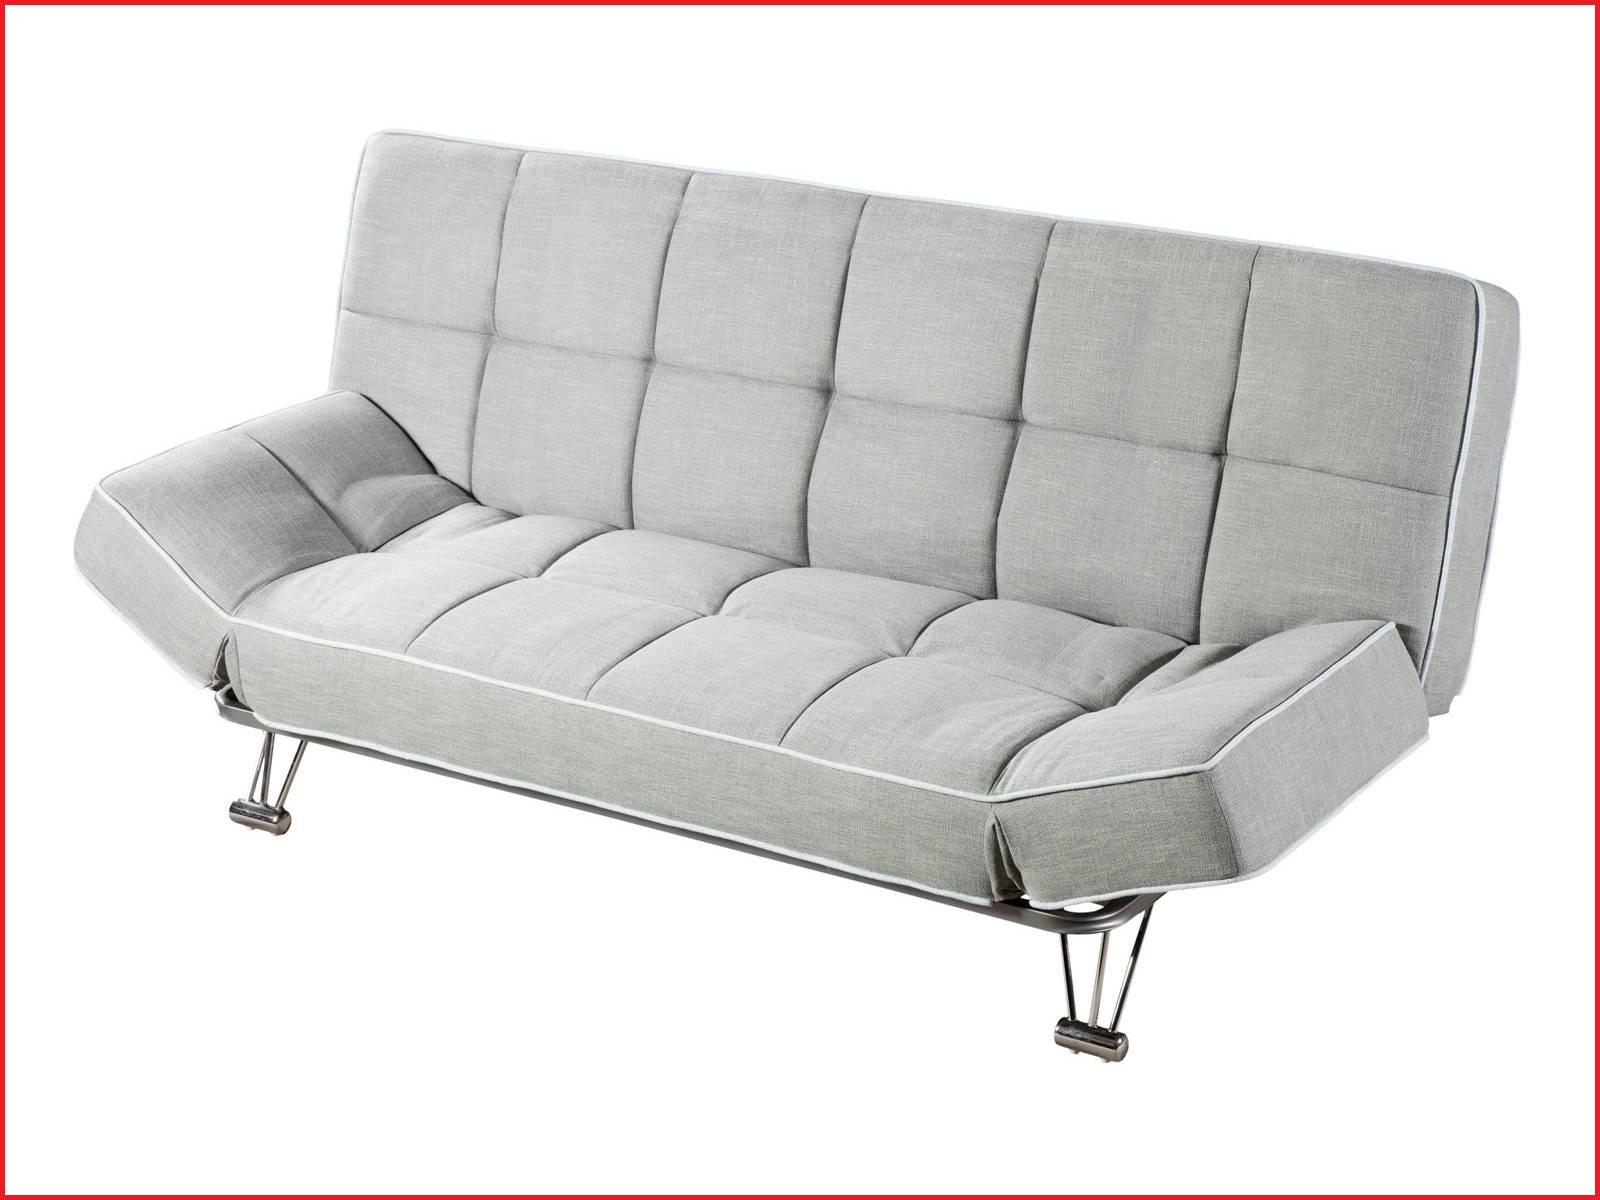 Sofa Cama Merkamueble Nkde sofa Cama Merkamueble sofà Cama Clic Clac Gris